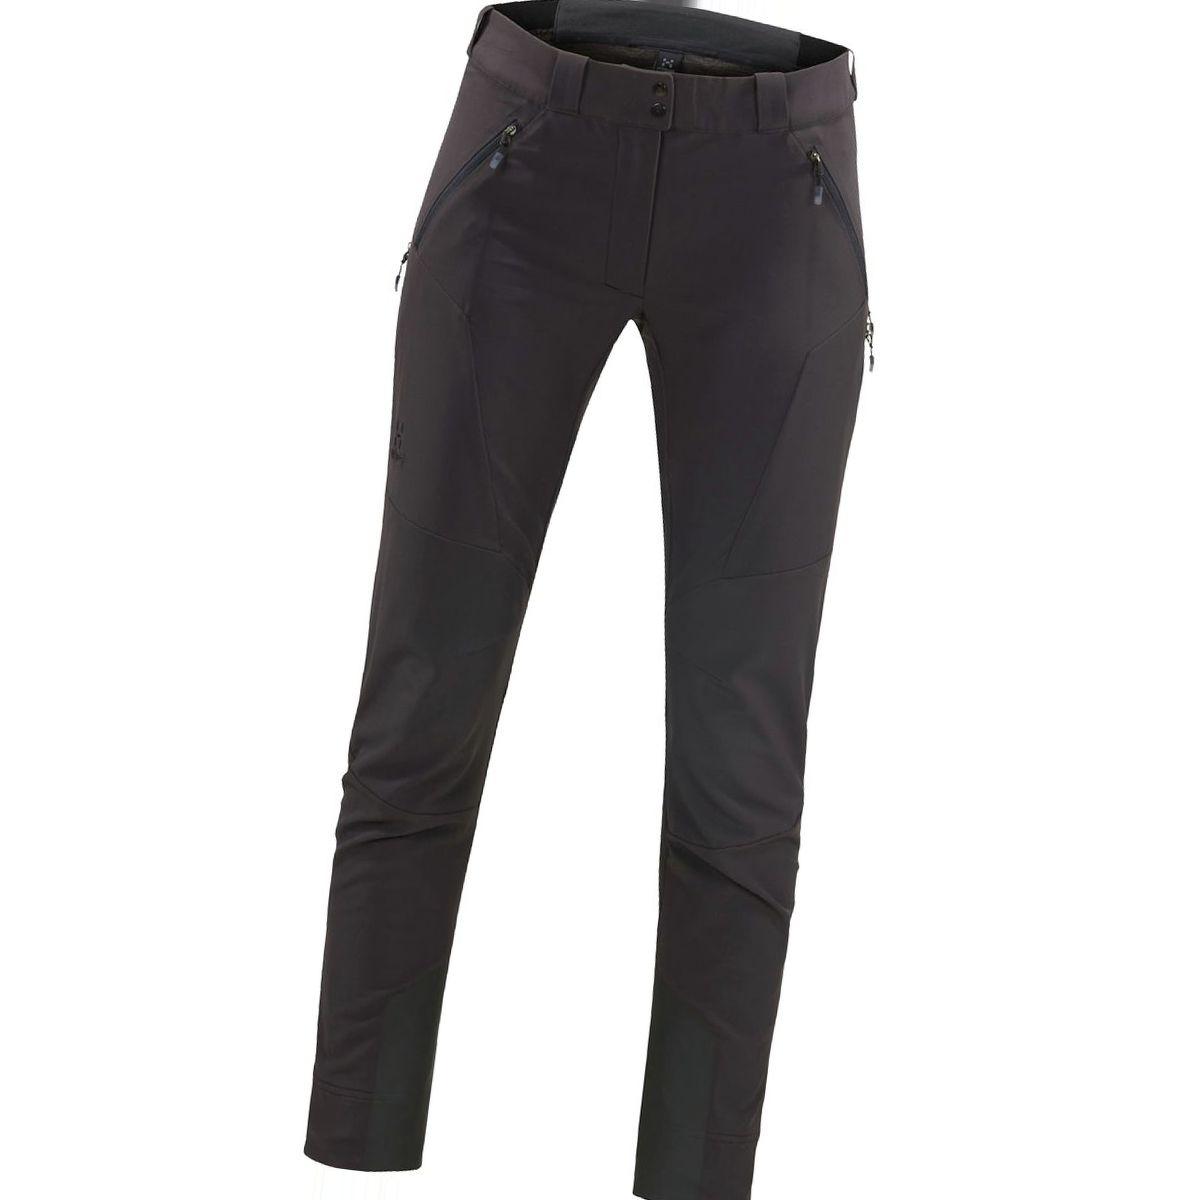 Haglofs Roc Fusion Pant - Women's